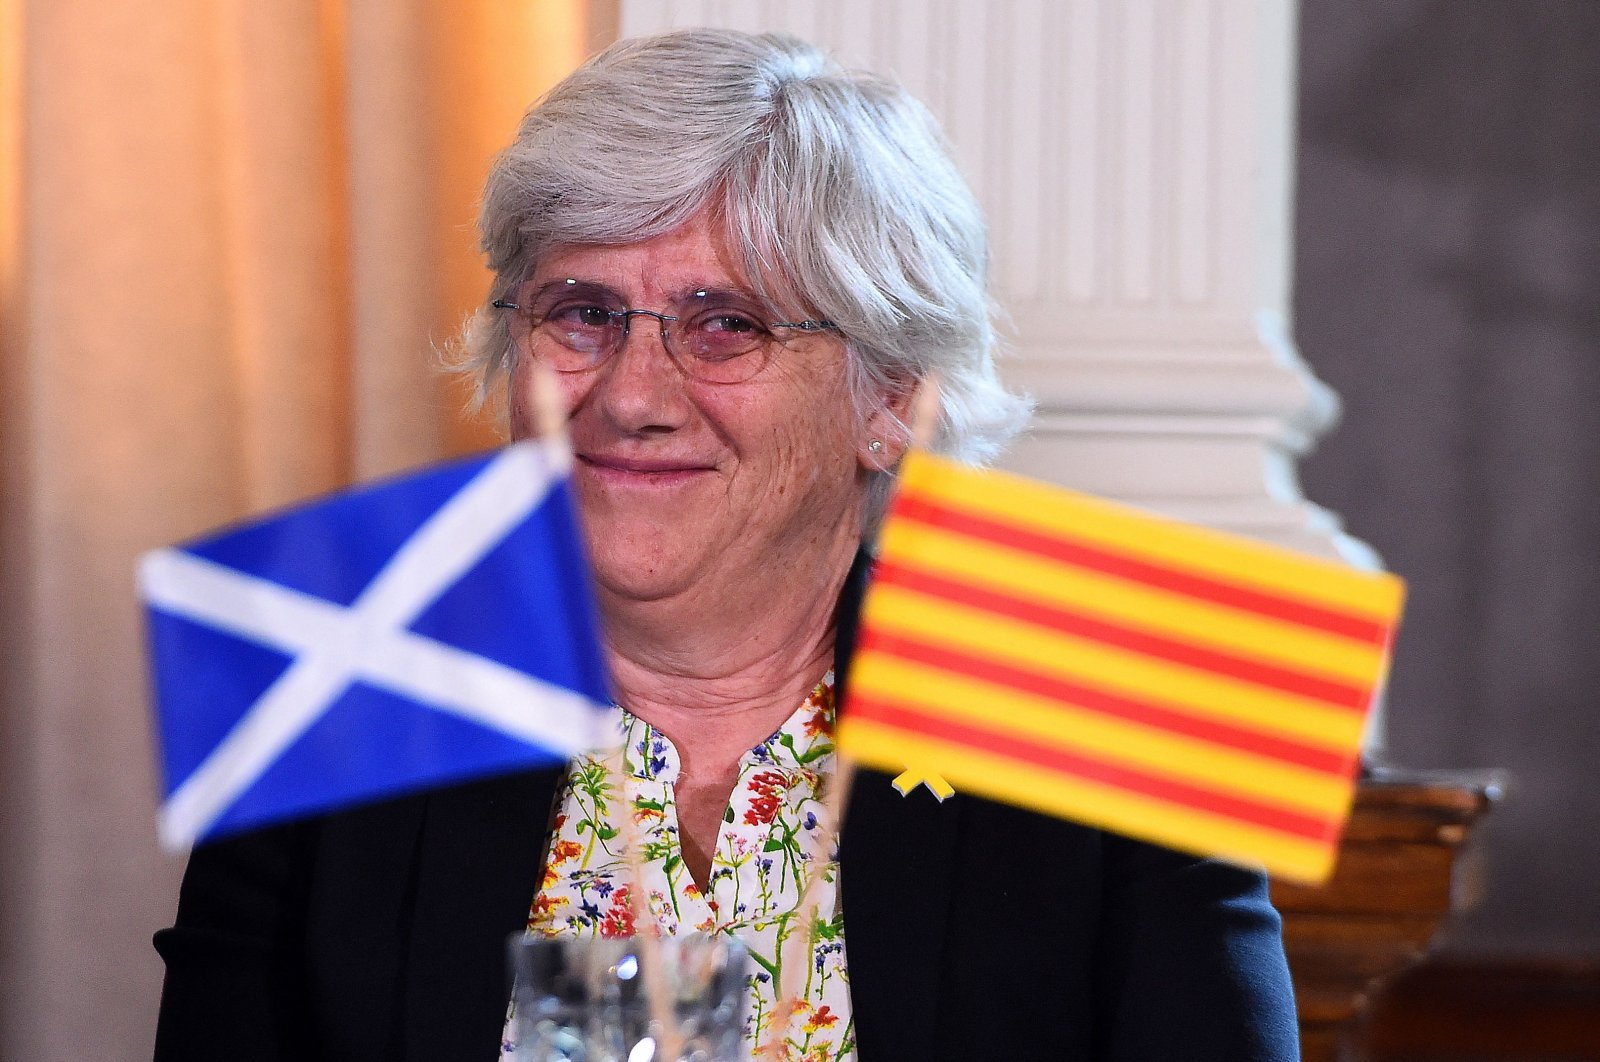 Catalonia's former Education Minister Clara Ponsati attends a press conference in Edinburgh, Scotland, July 11, 2018. (AFP Photo)